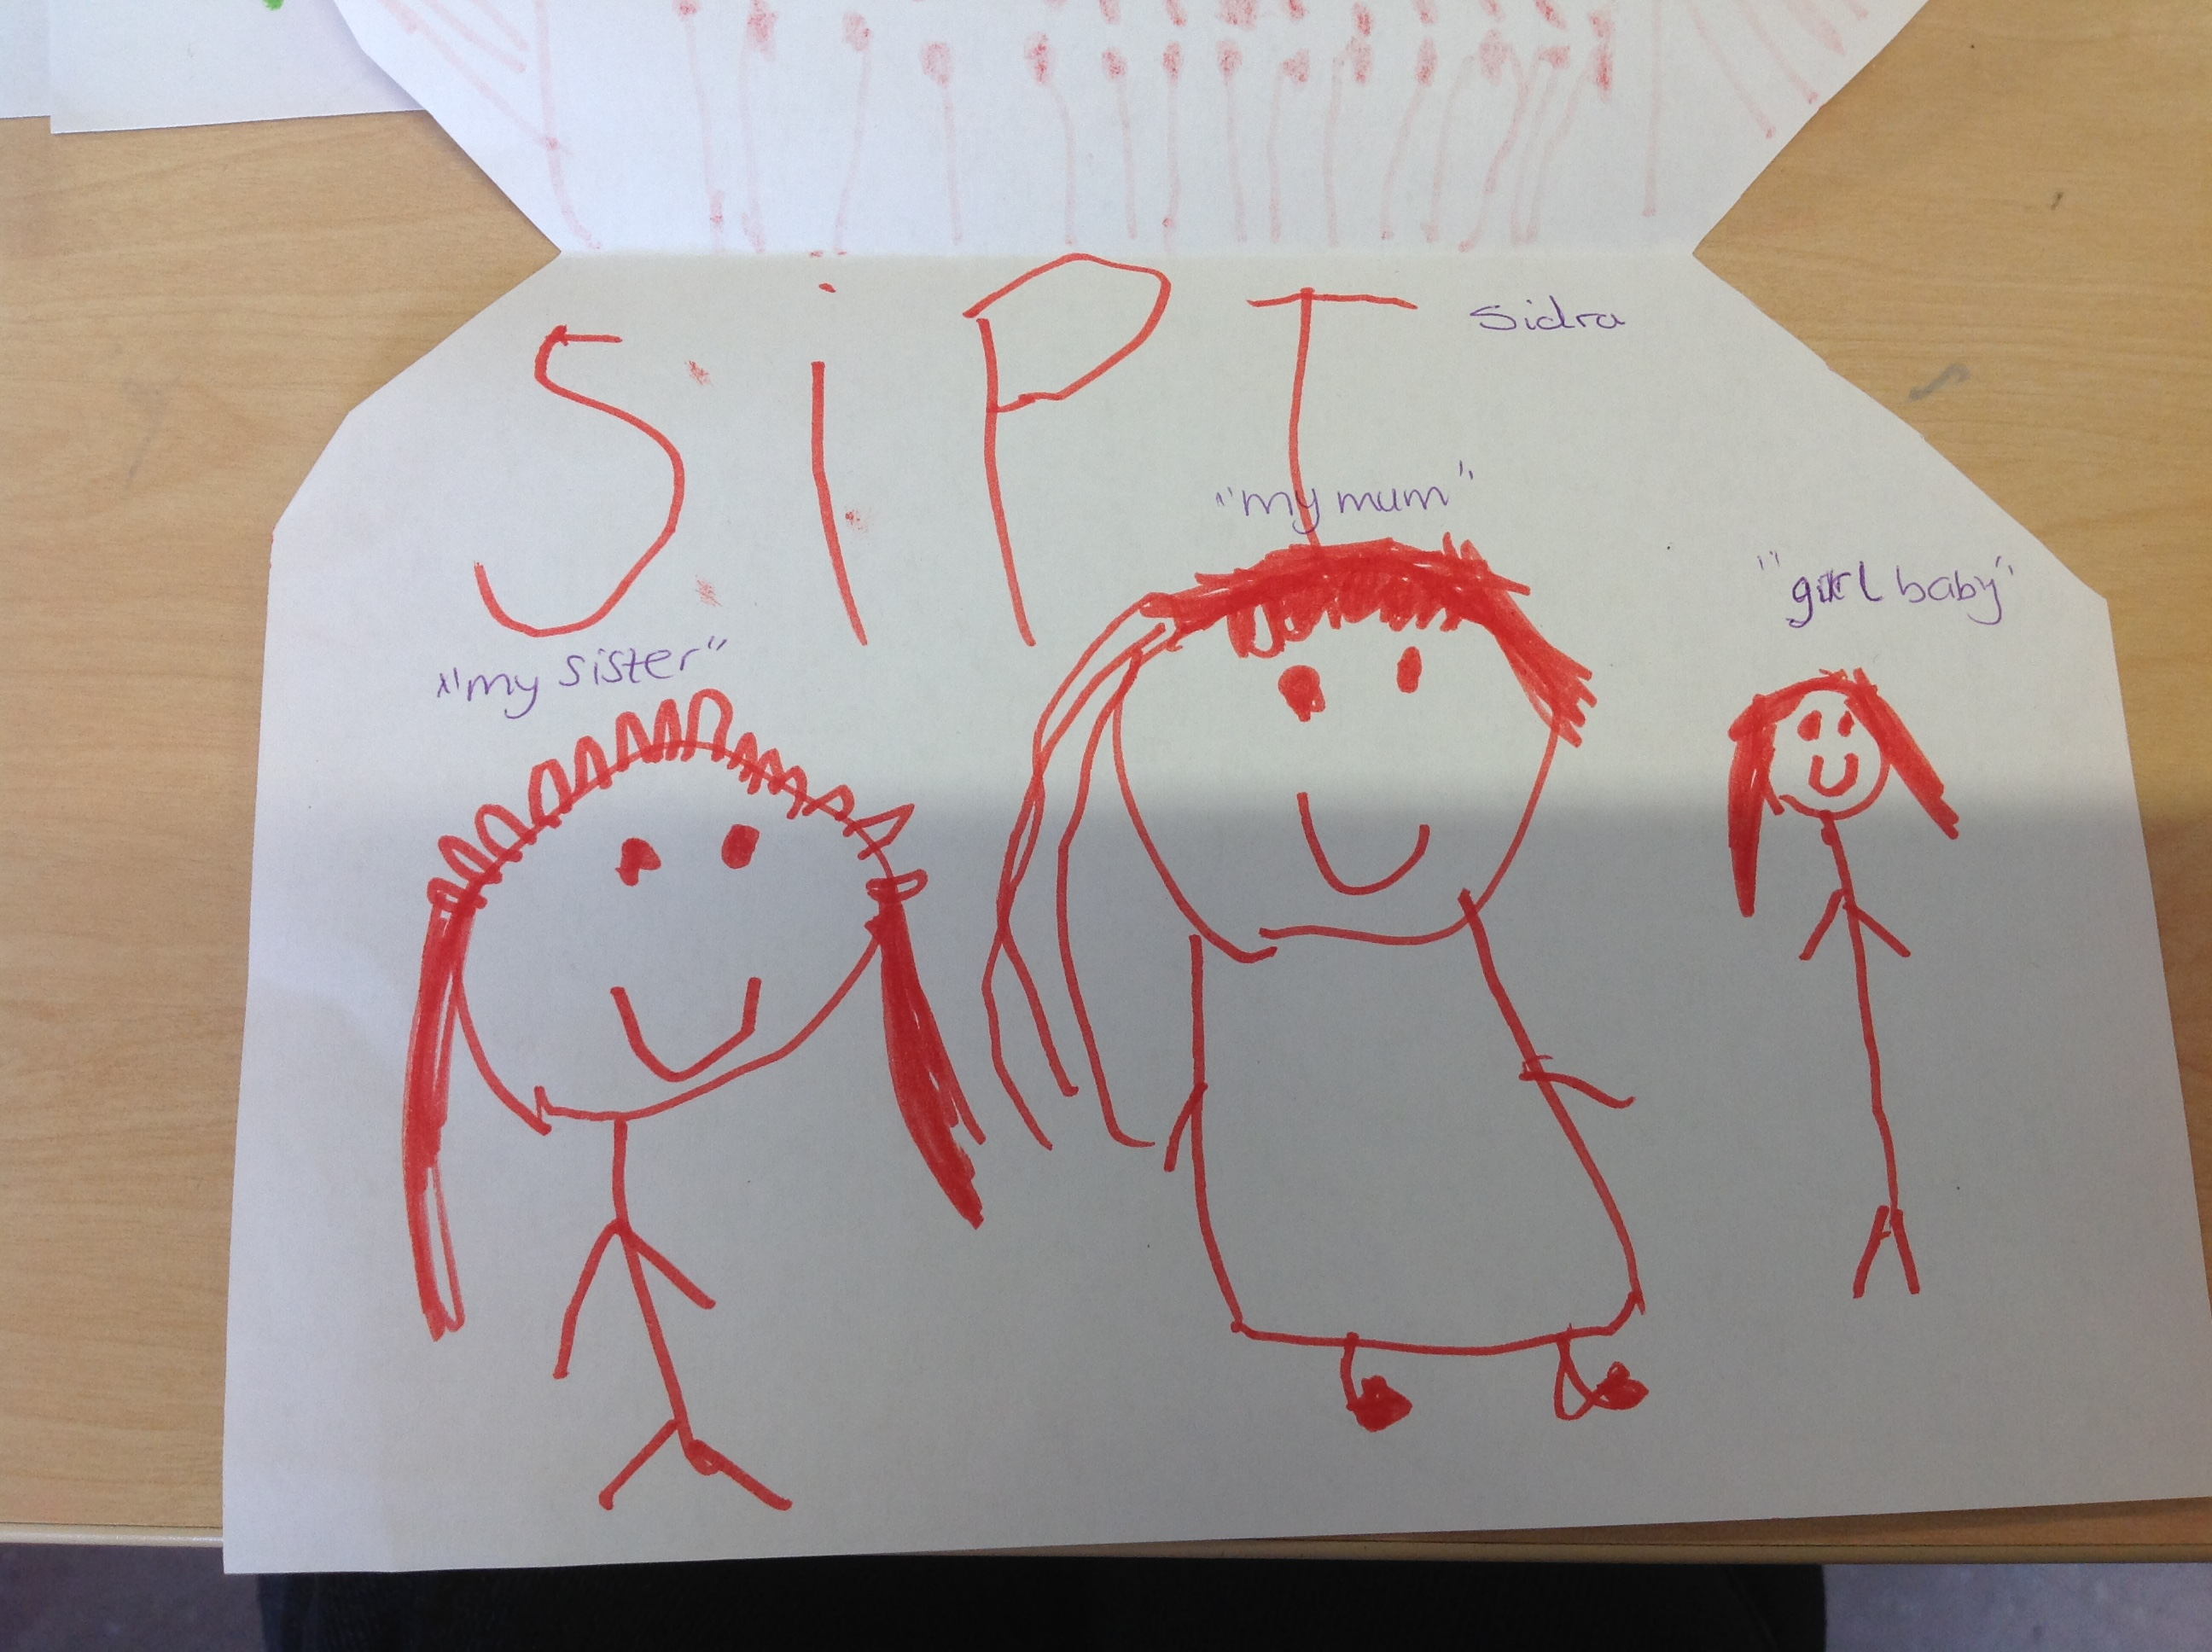 Sidra's wonderful drawing!